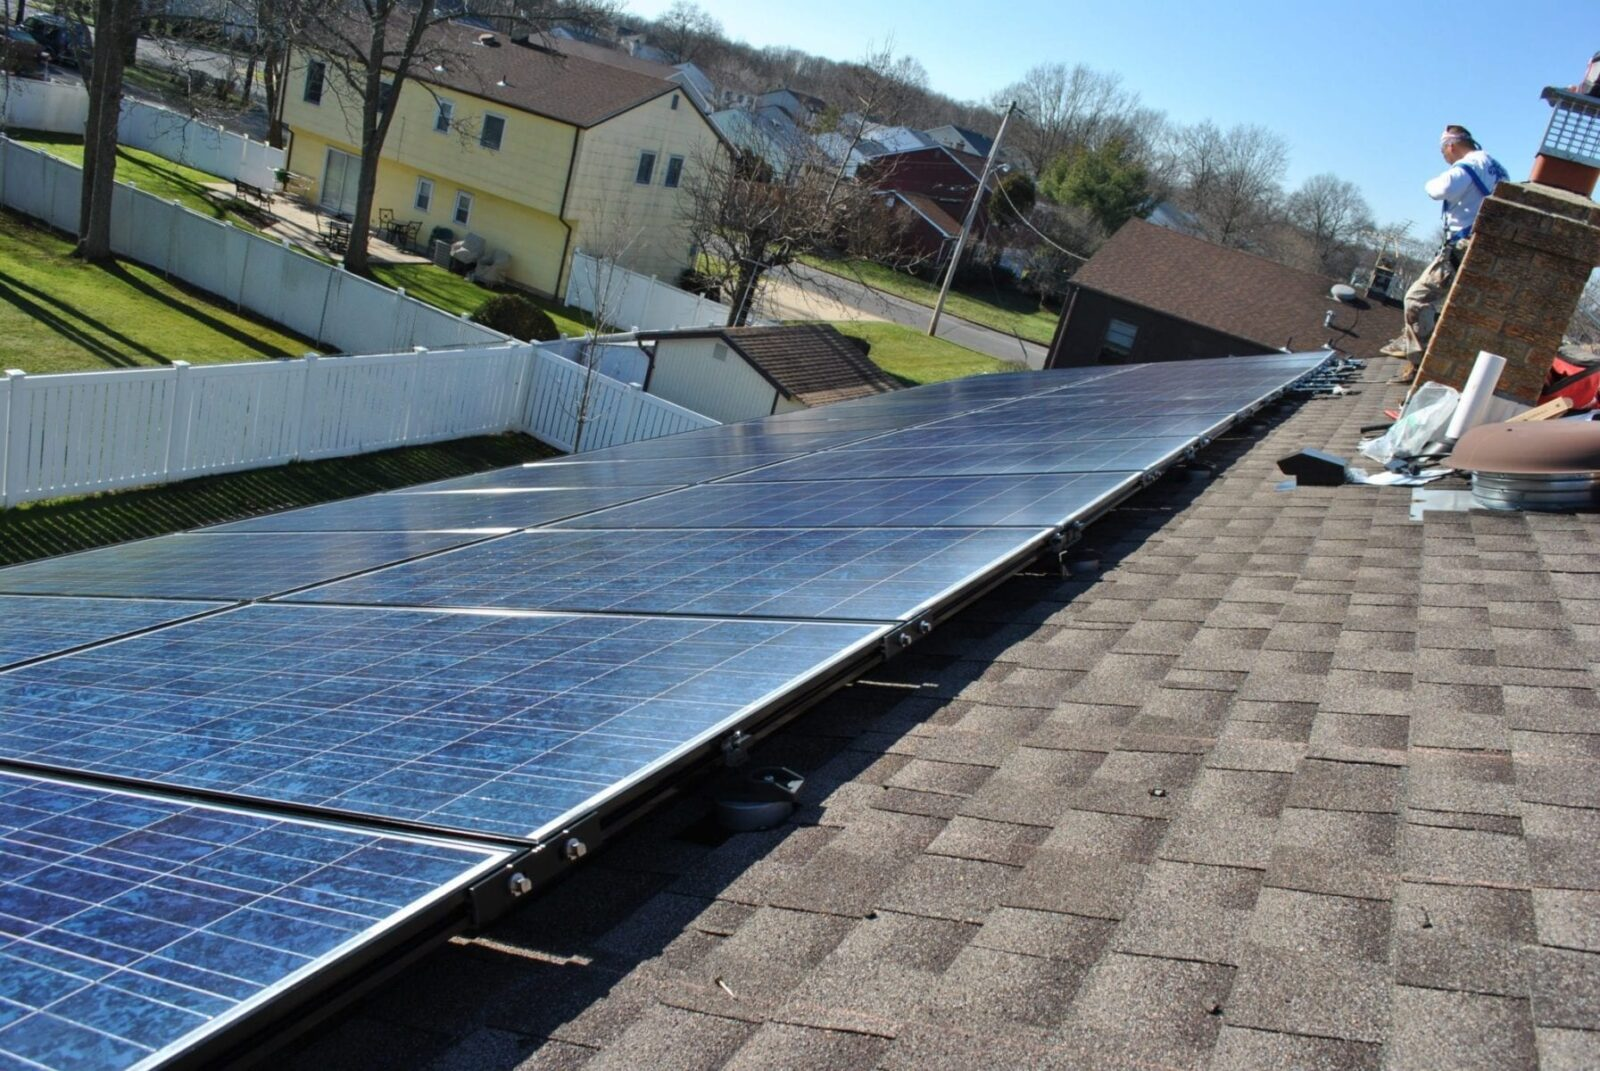 Nj Solar Panels In South Plainfield Green Sun Energy